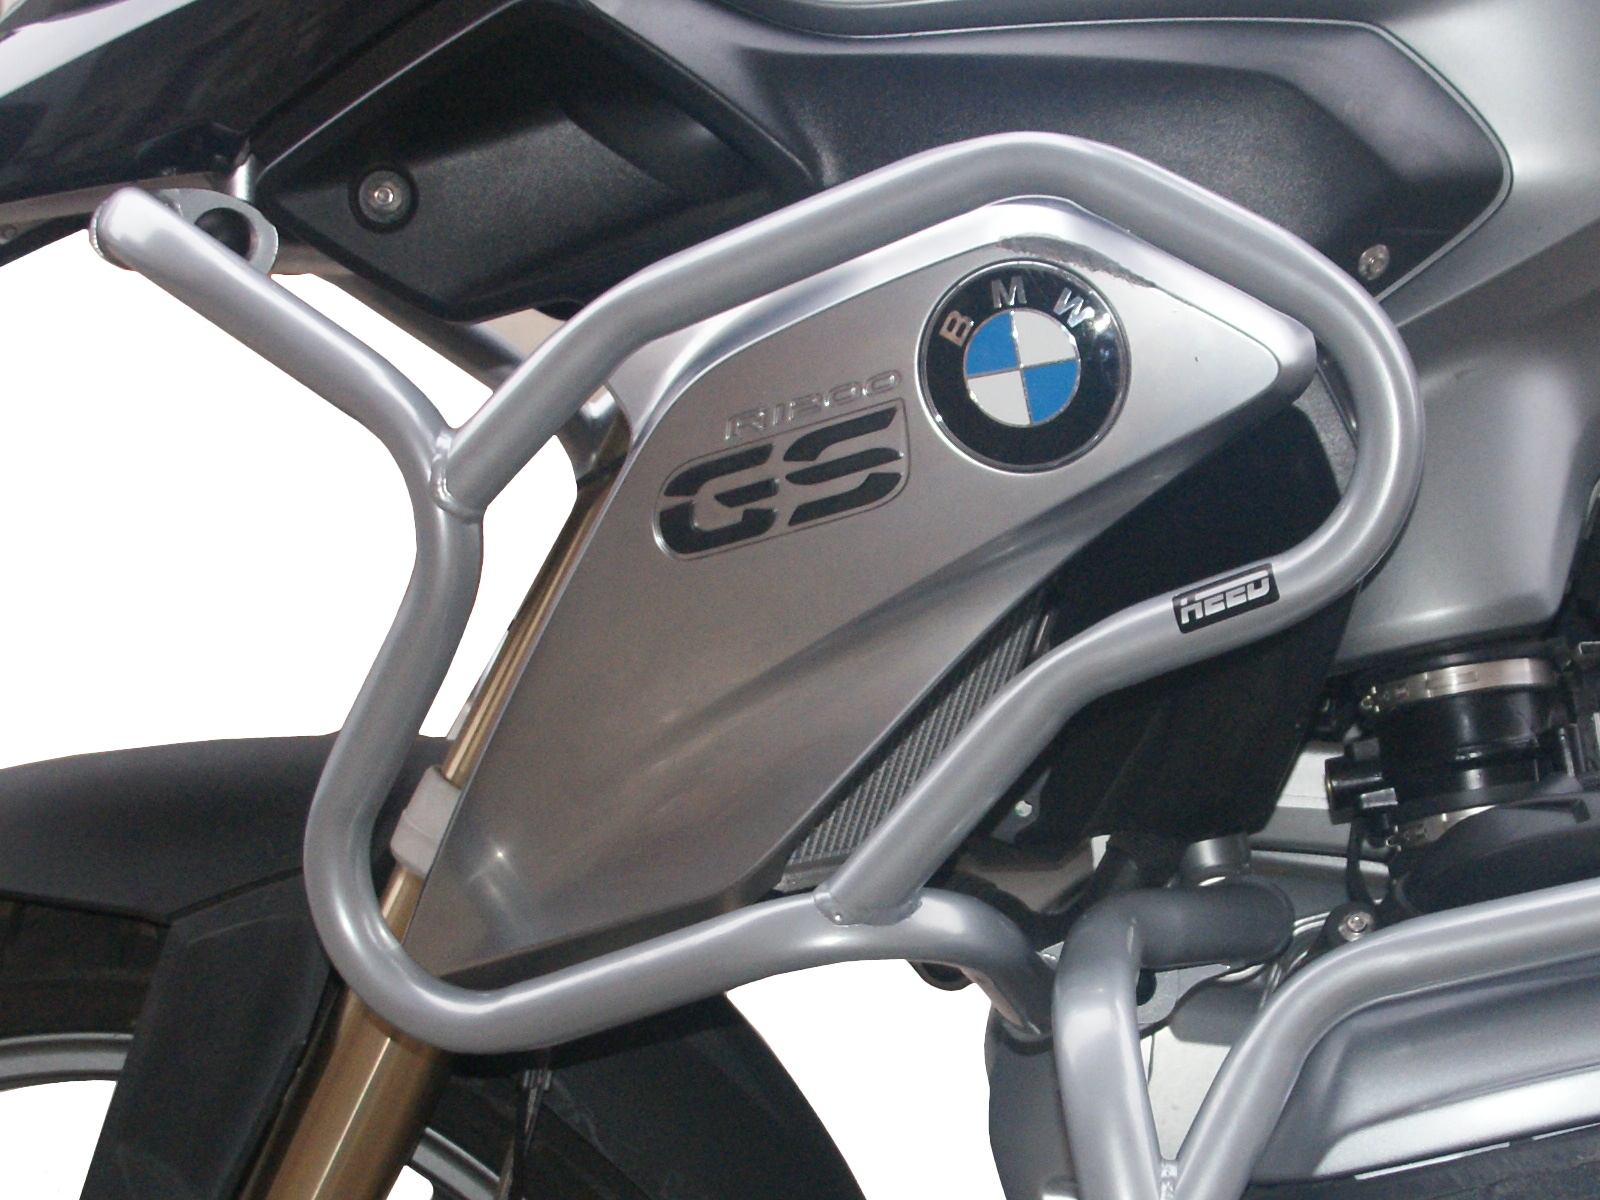 Gmole HEED BMW 1200 GS góra exclusive sreb.2013-16